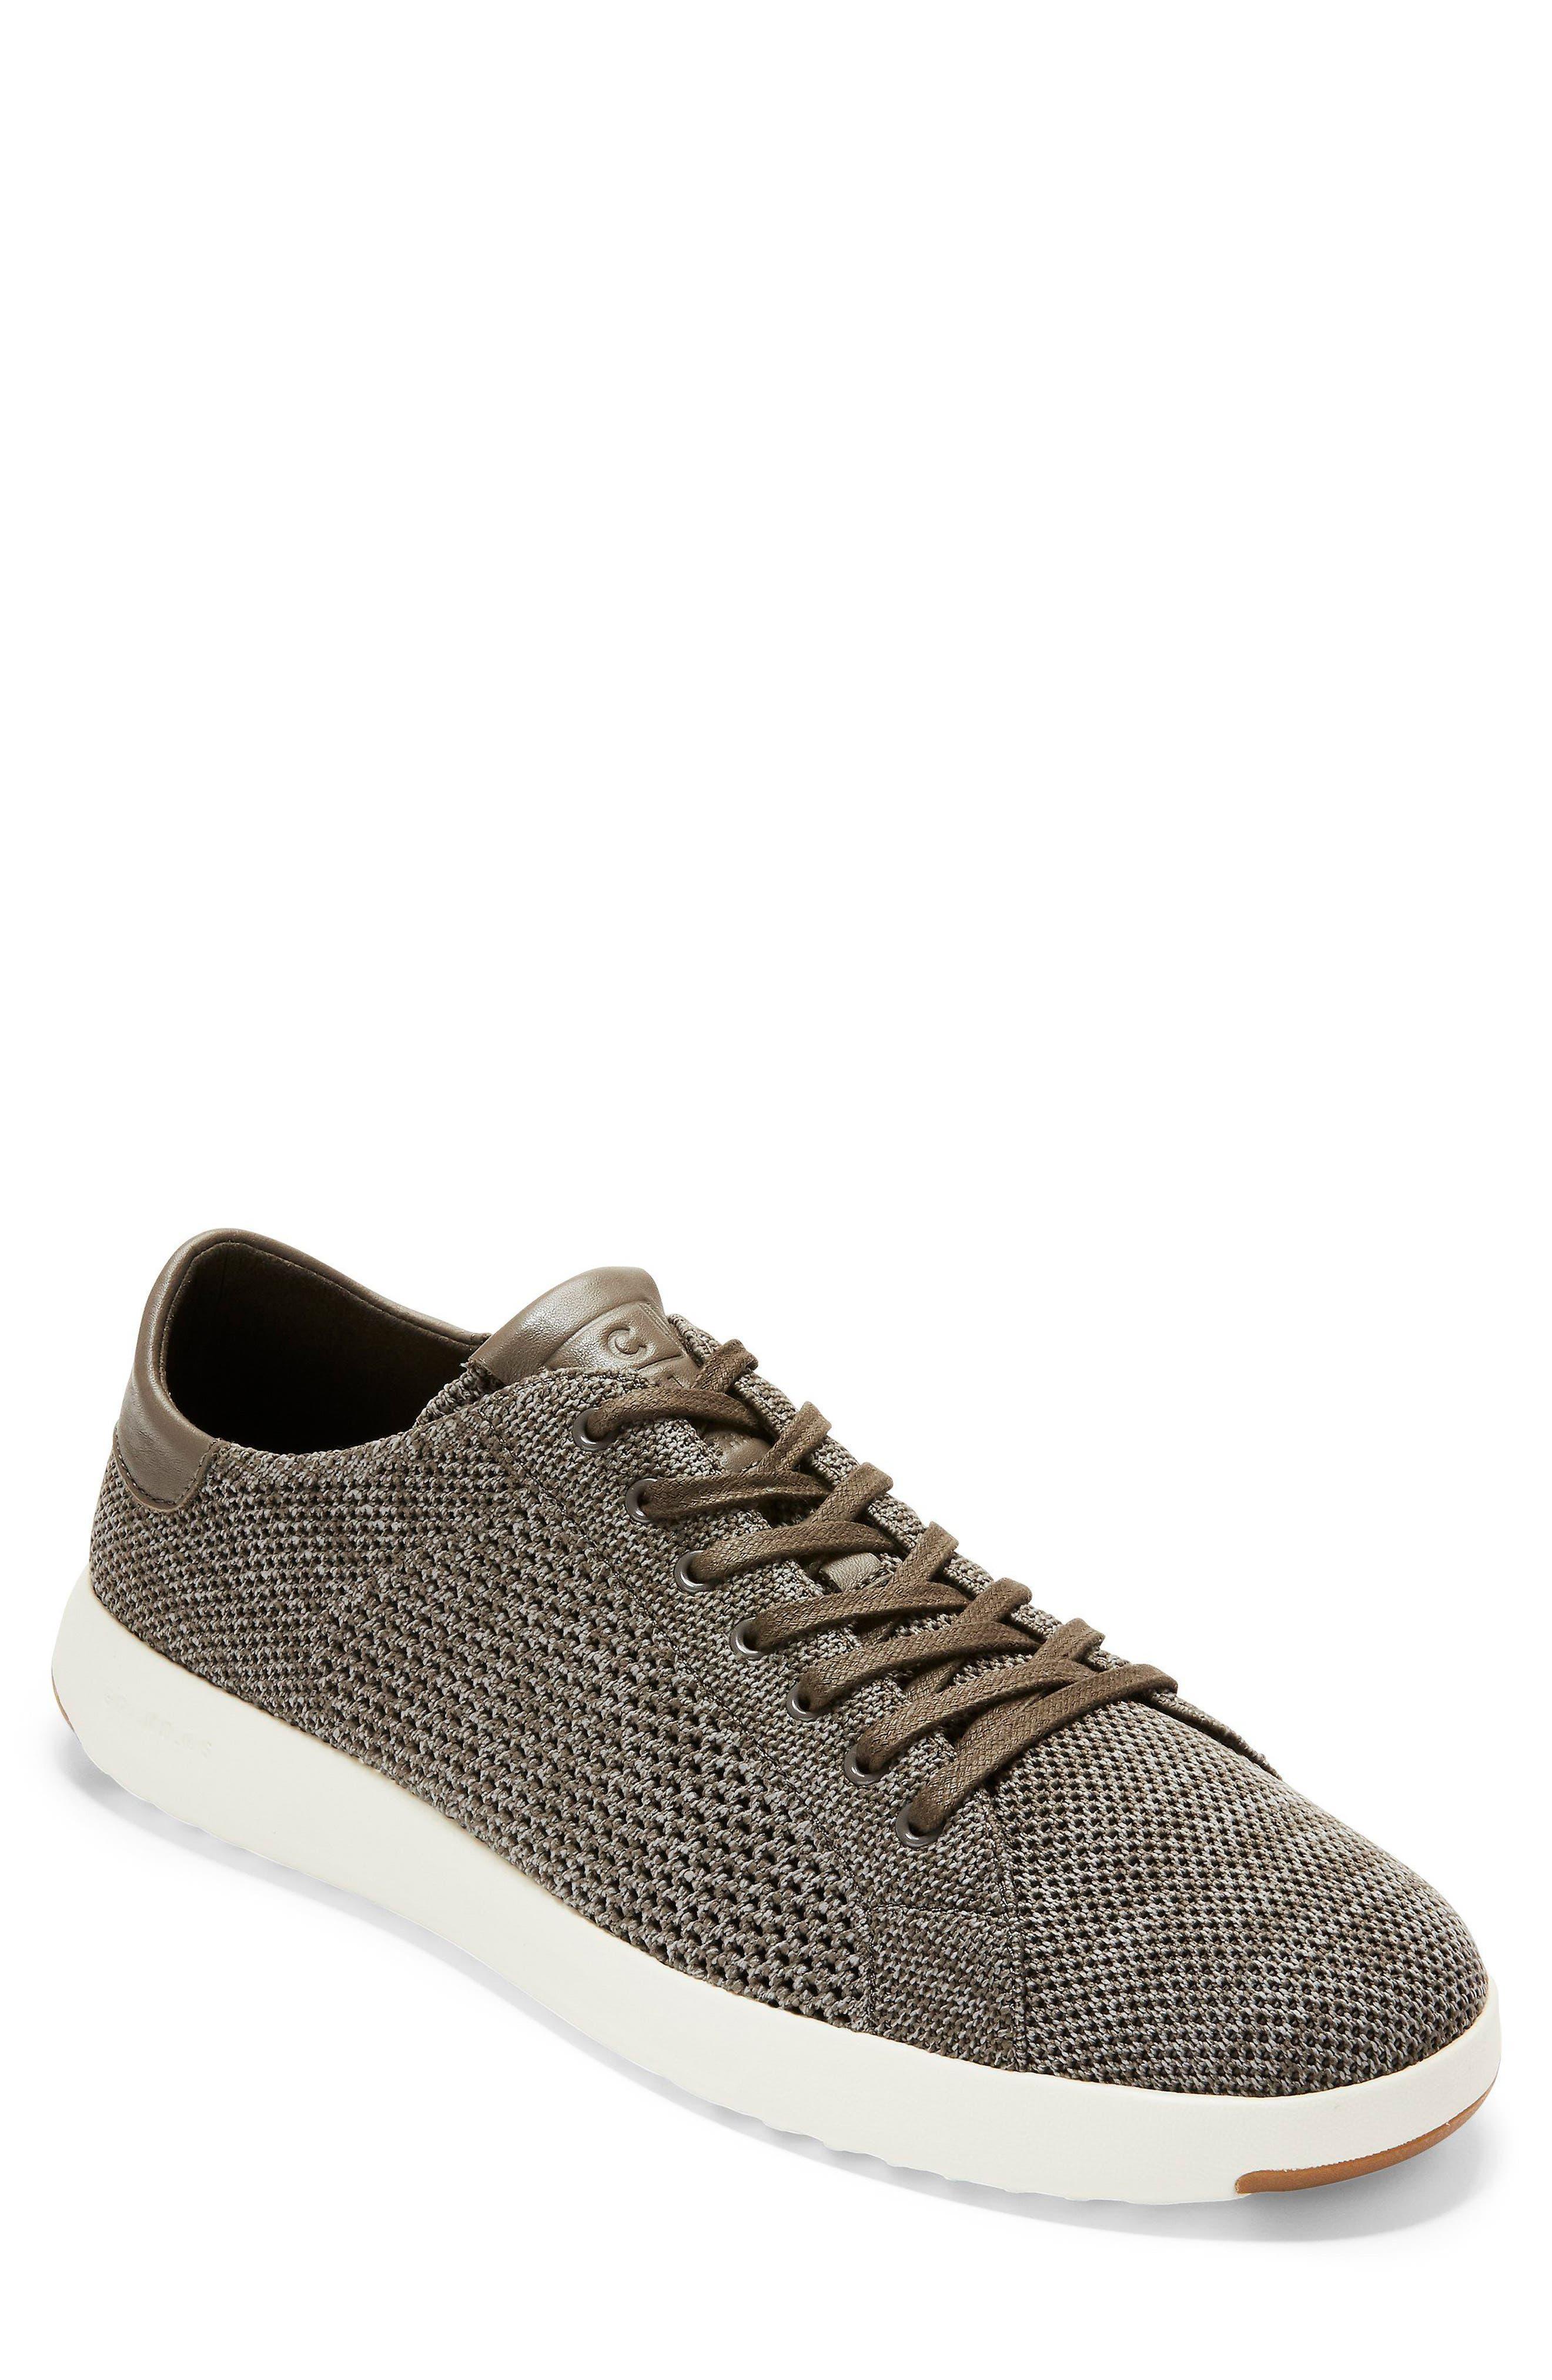 GrandPro Tennis Stitchlite Sneaker,                             Main thumbnail 2, color,